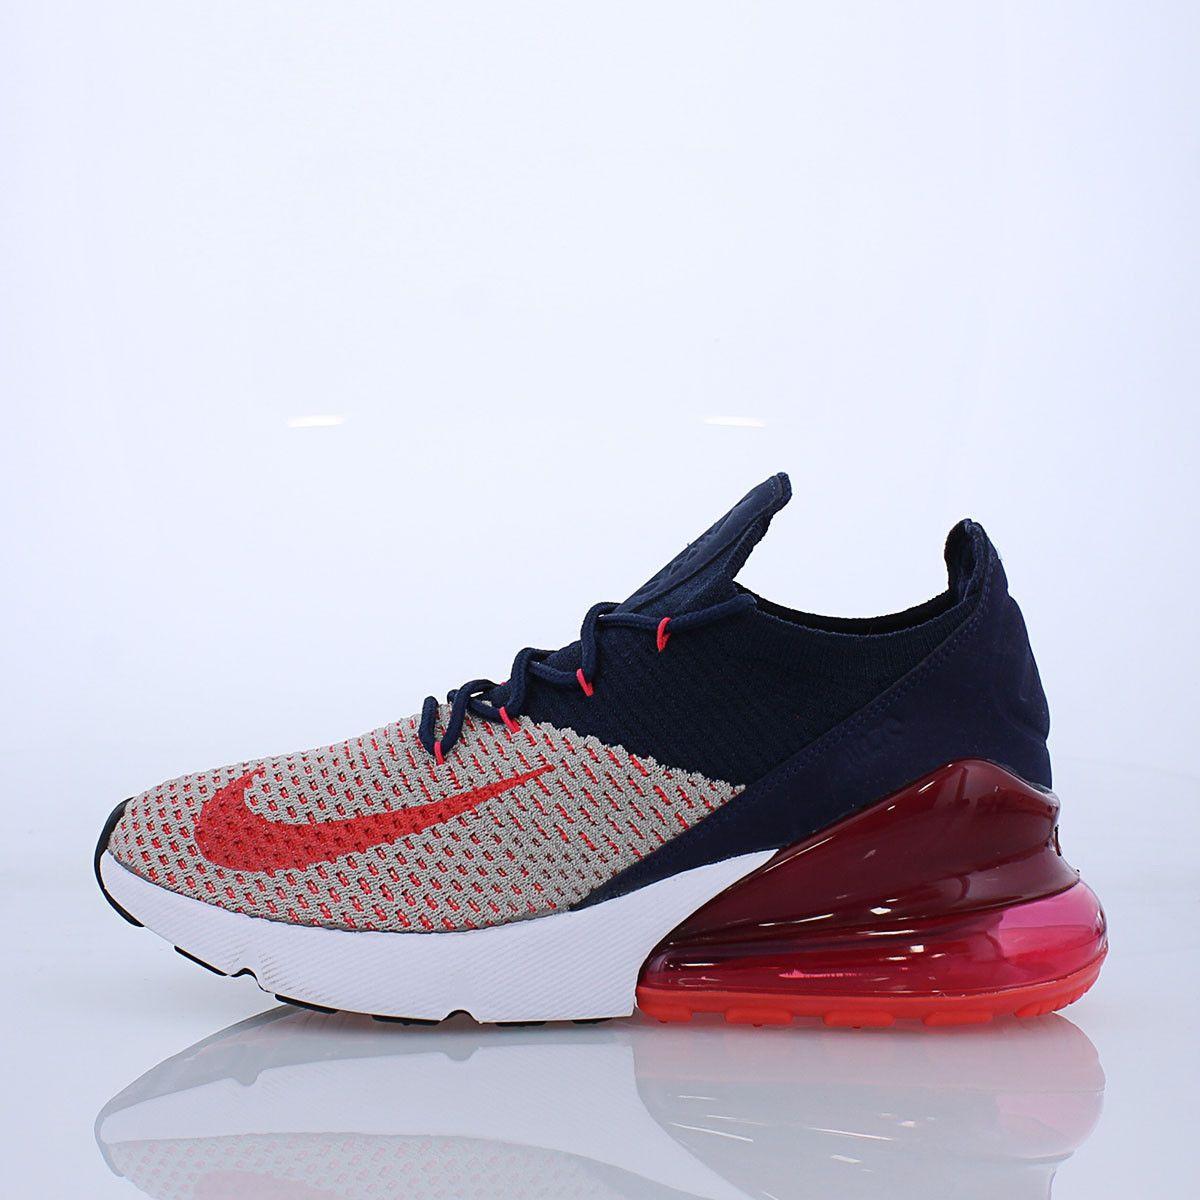 Nike Air Max 270 Flyknit (W) | Air max 270, Sneakers nike